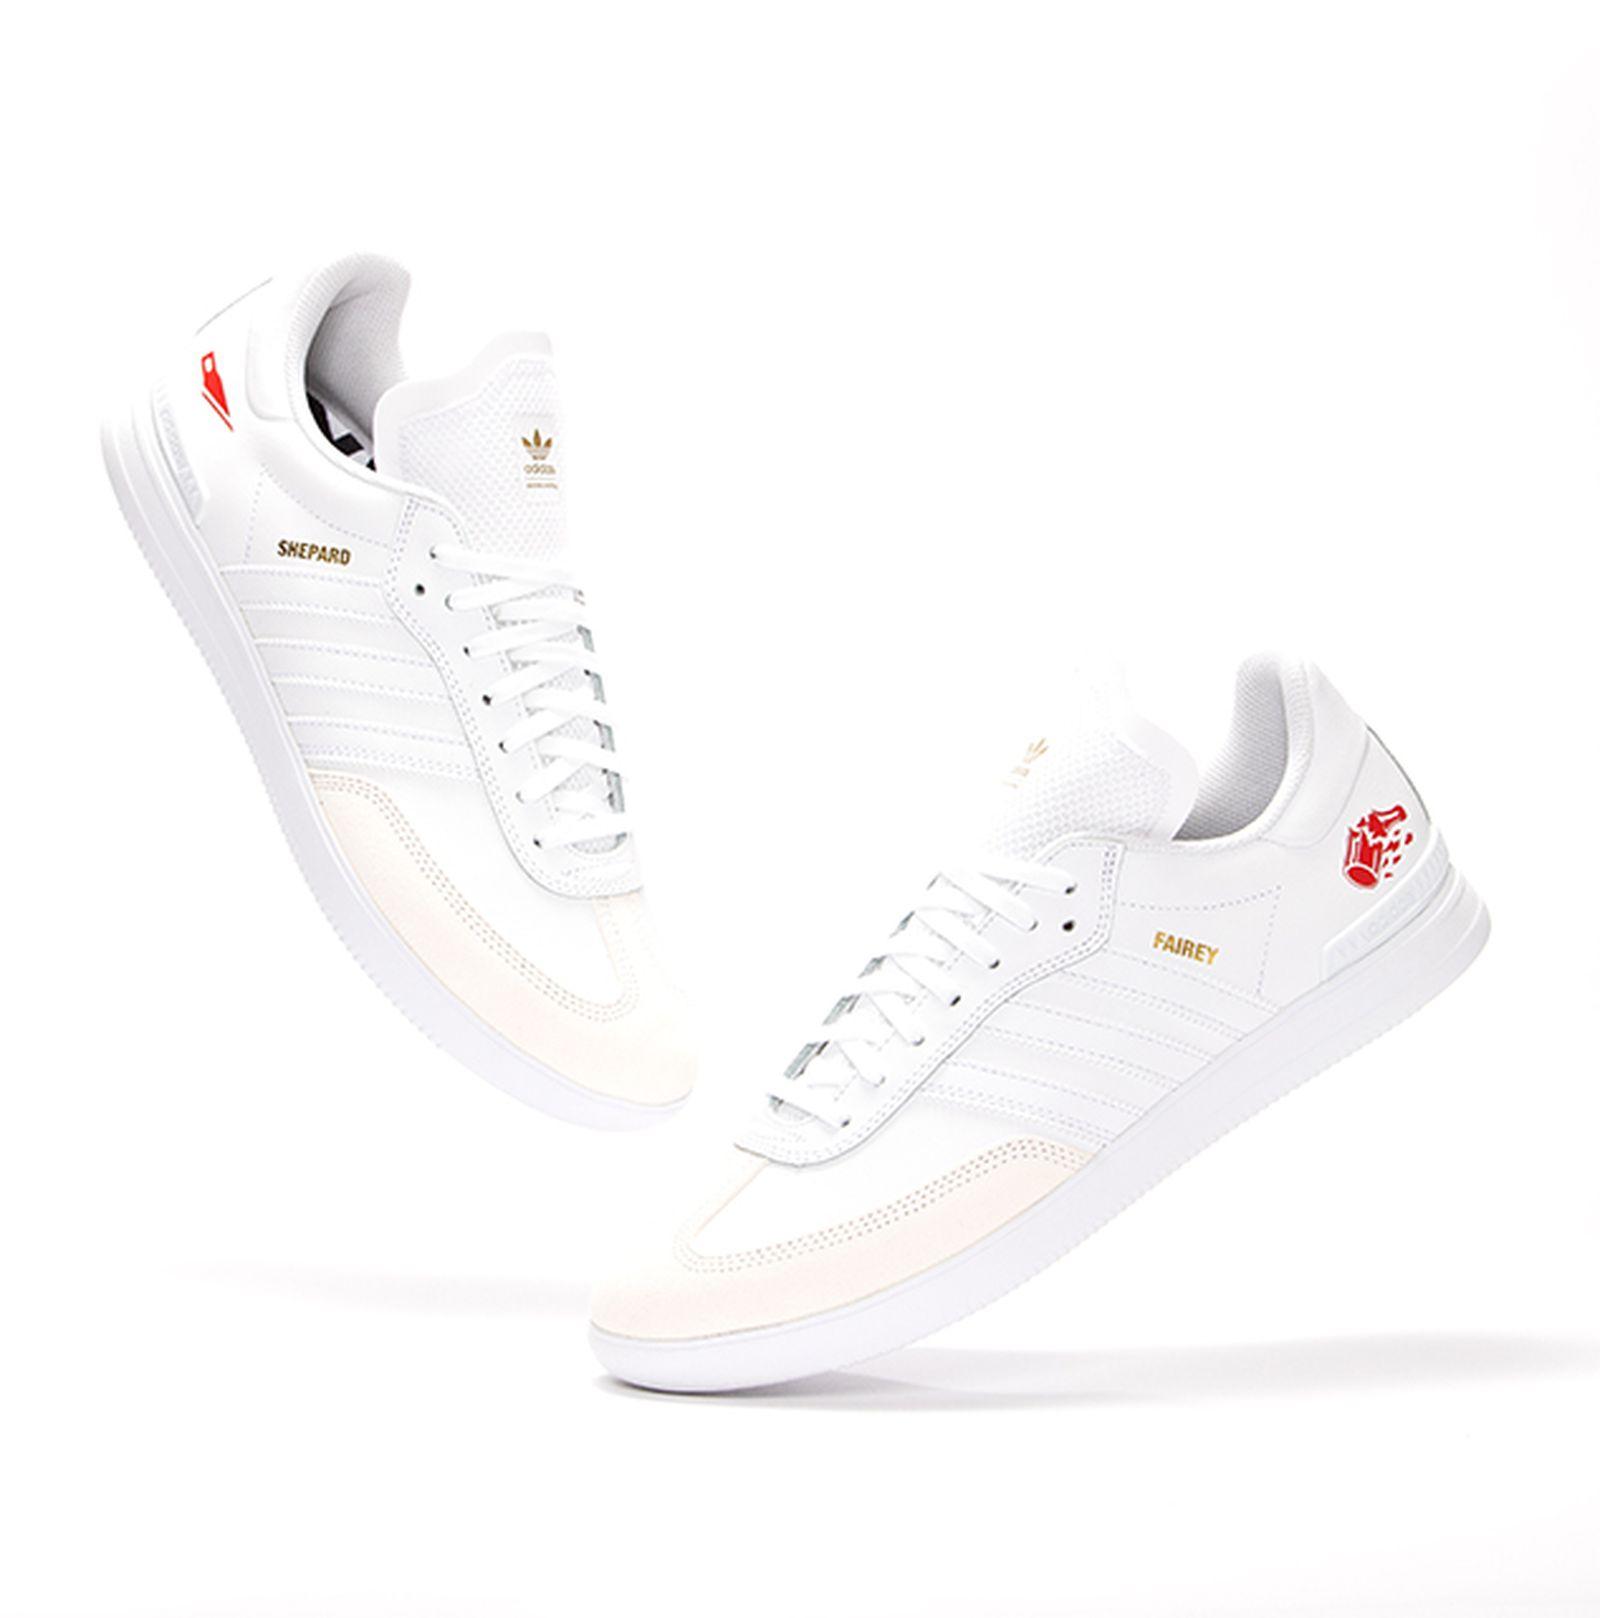 adidas samba adv shepard fairey release date price Beyond The Streets adidas skateboarding